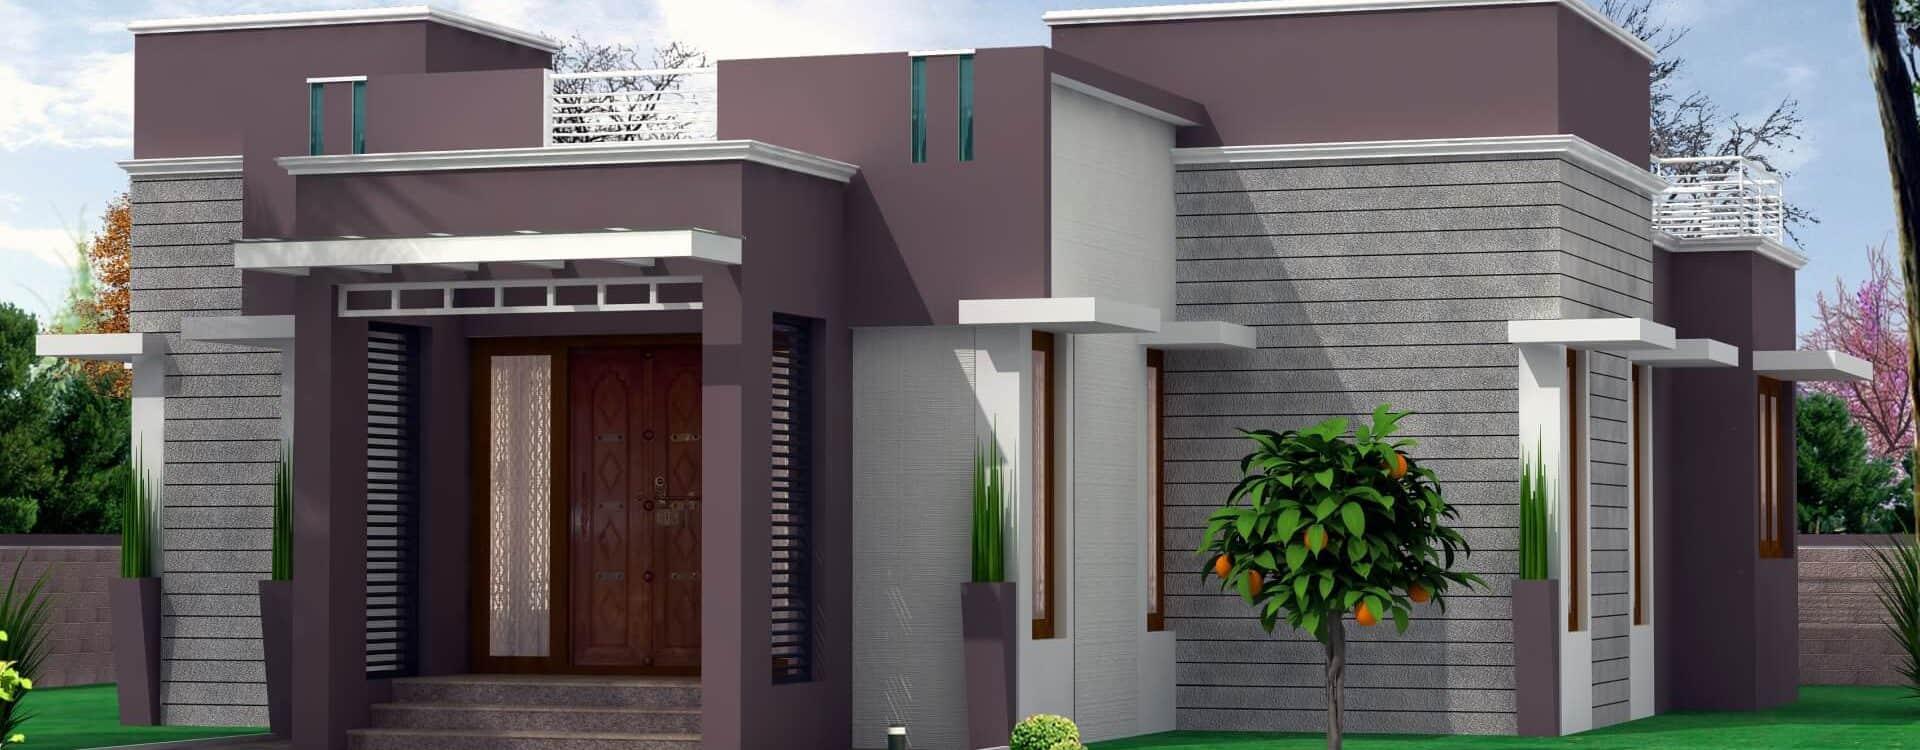 Residence for Mr. Sathish & Latha Pai at Bantwal